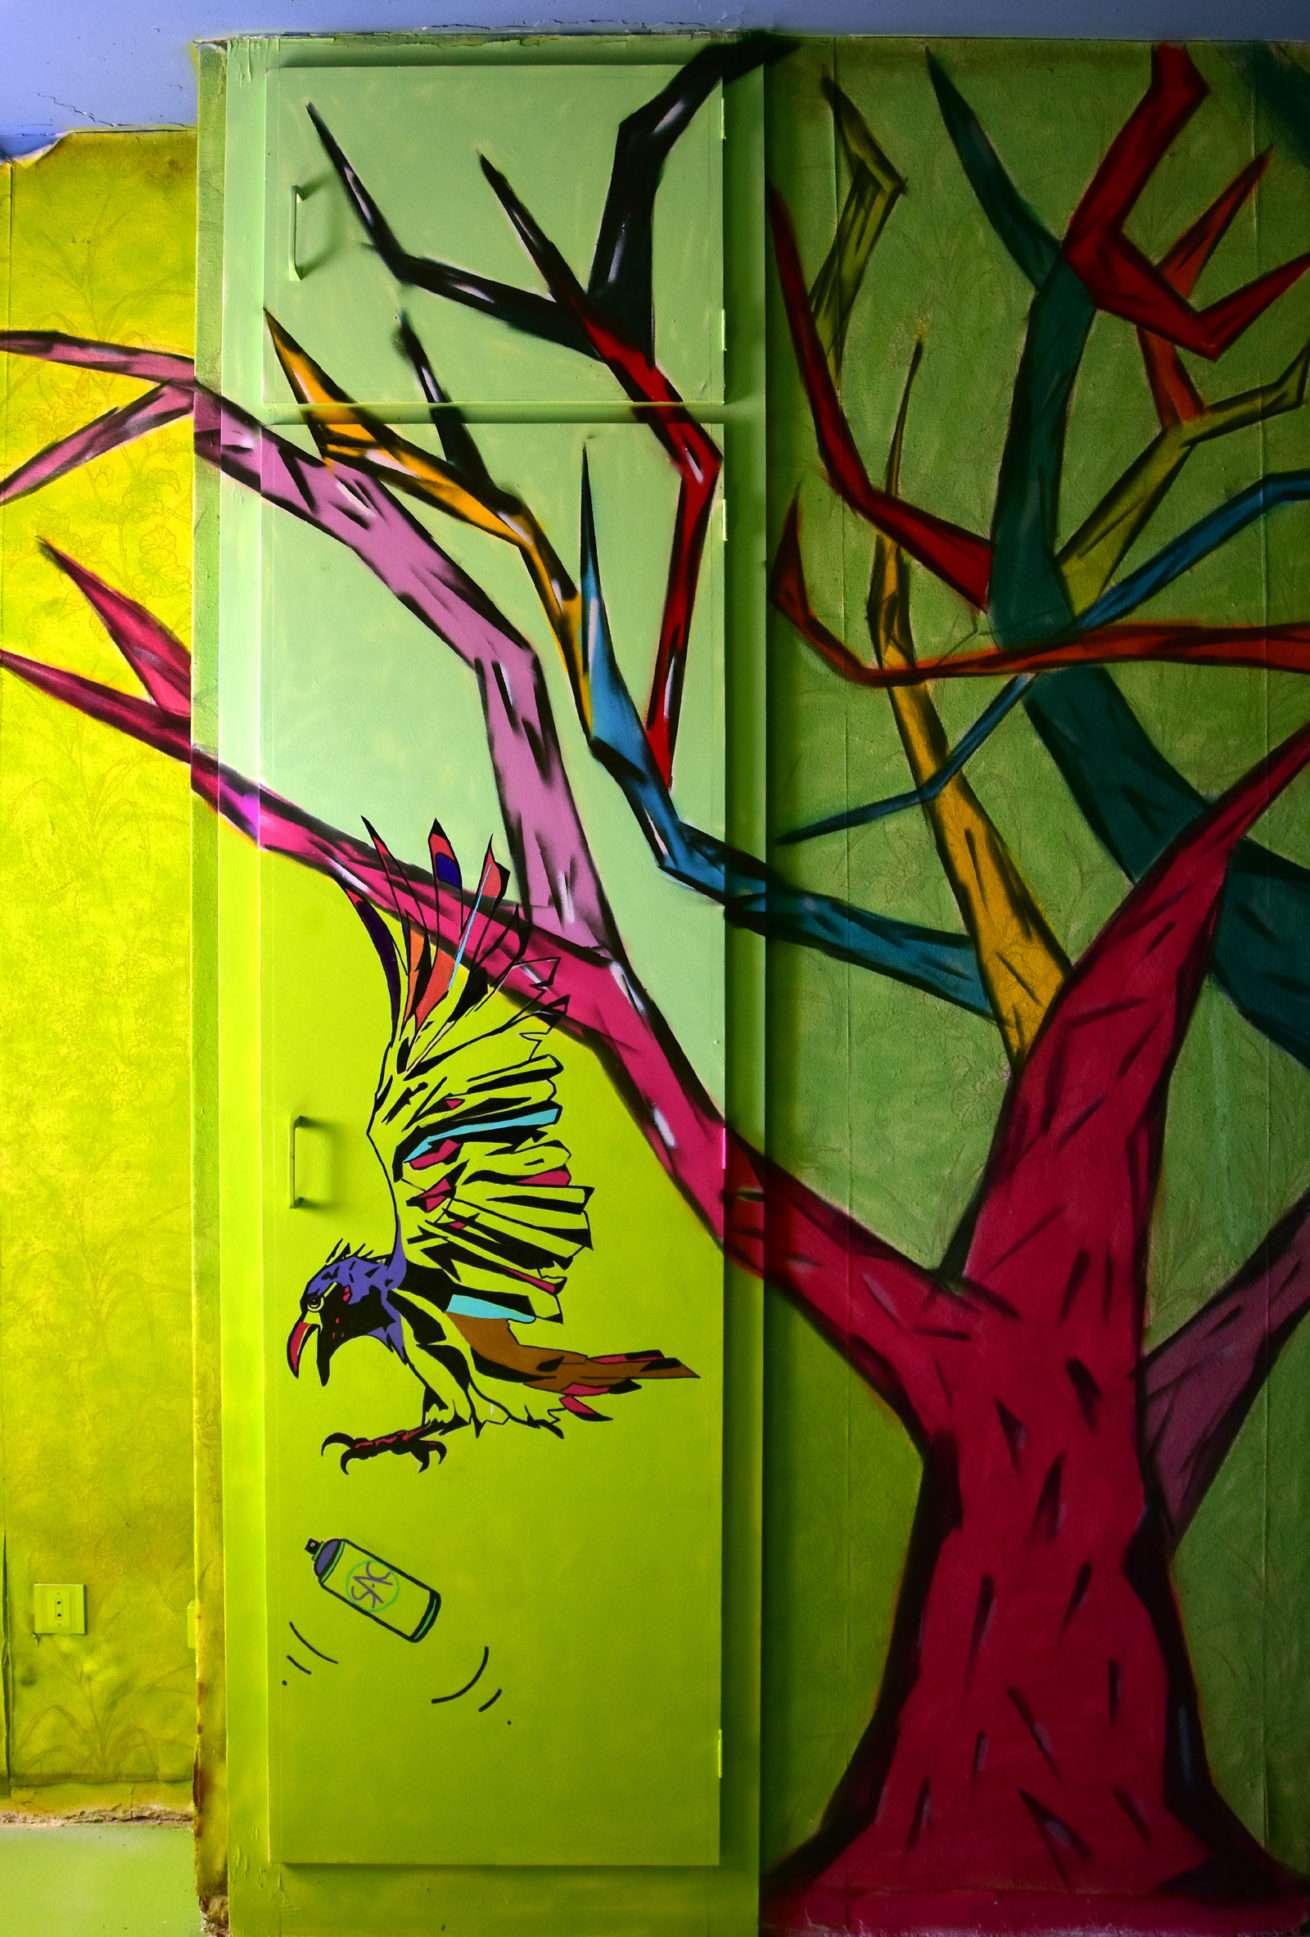 Yren_street-art-city_corbeau_hotel-128_chambre-126